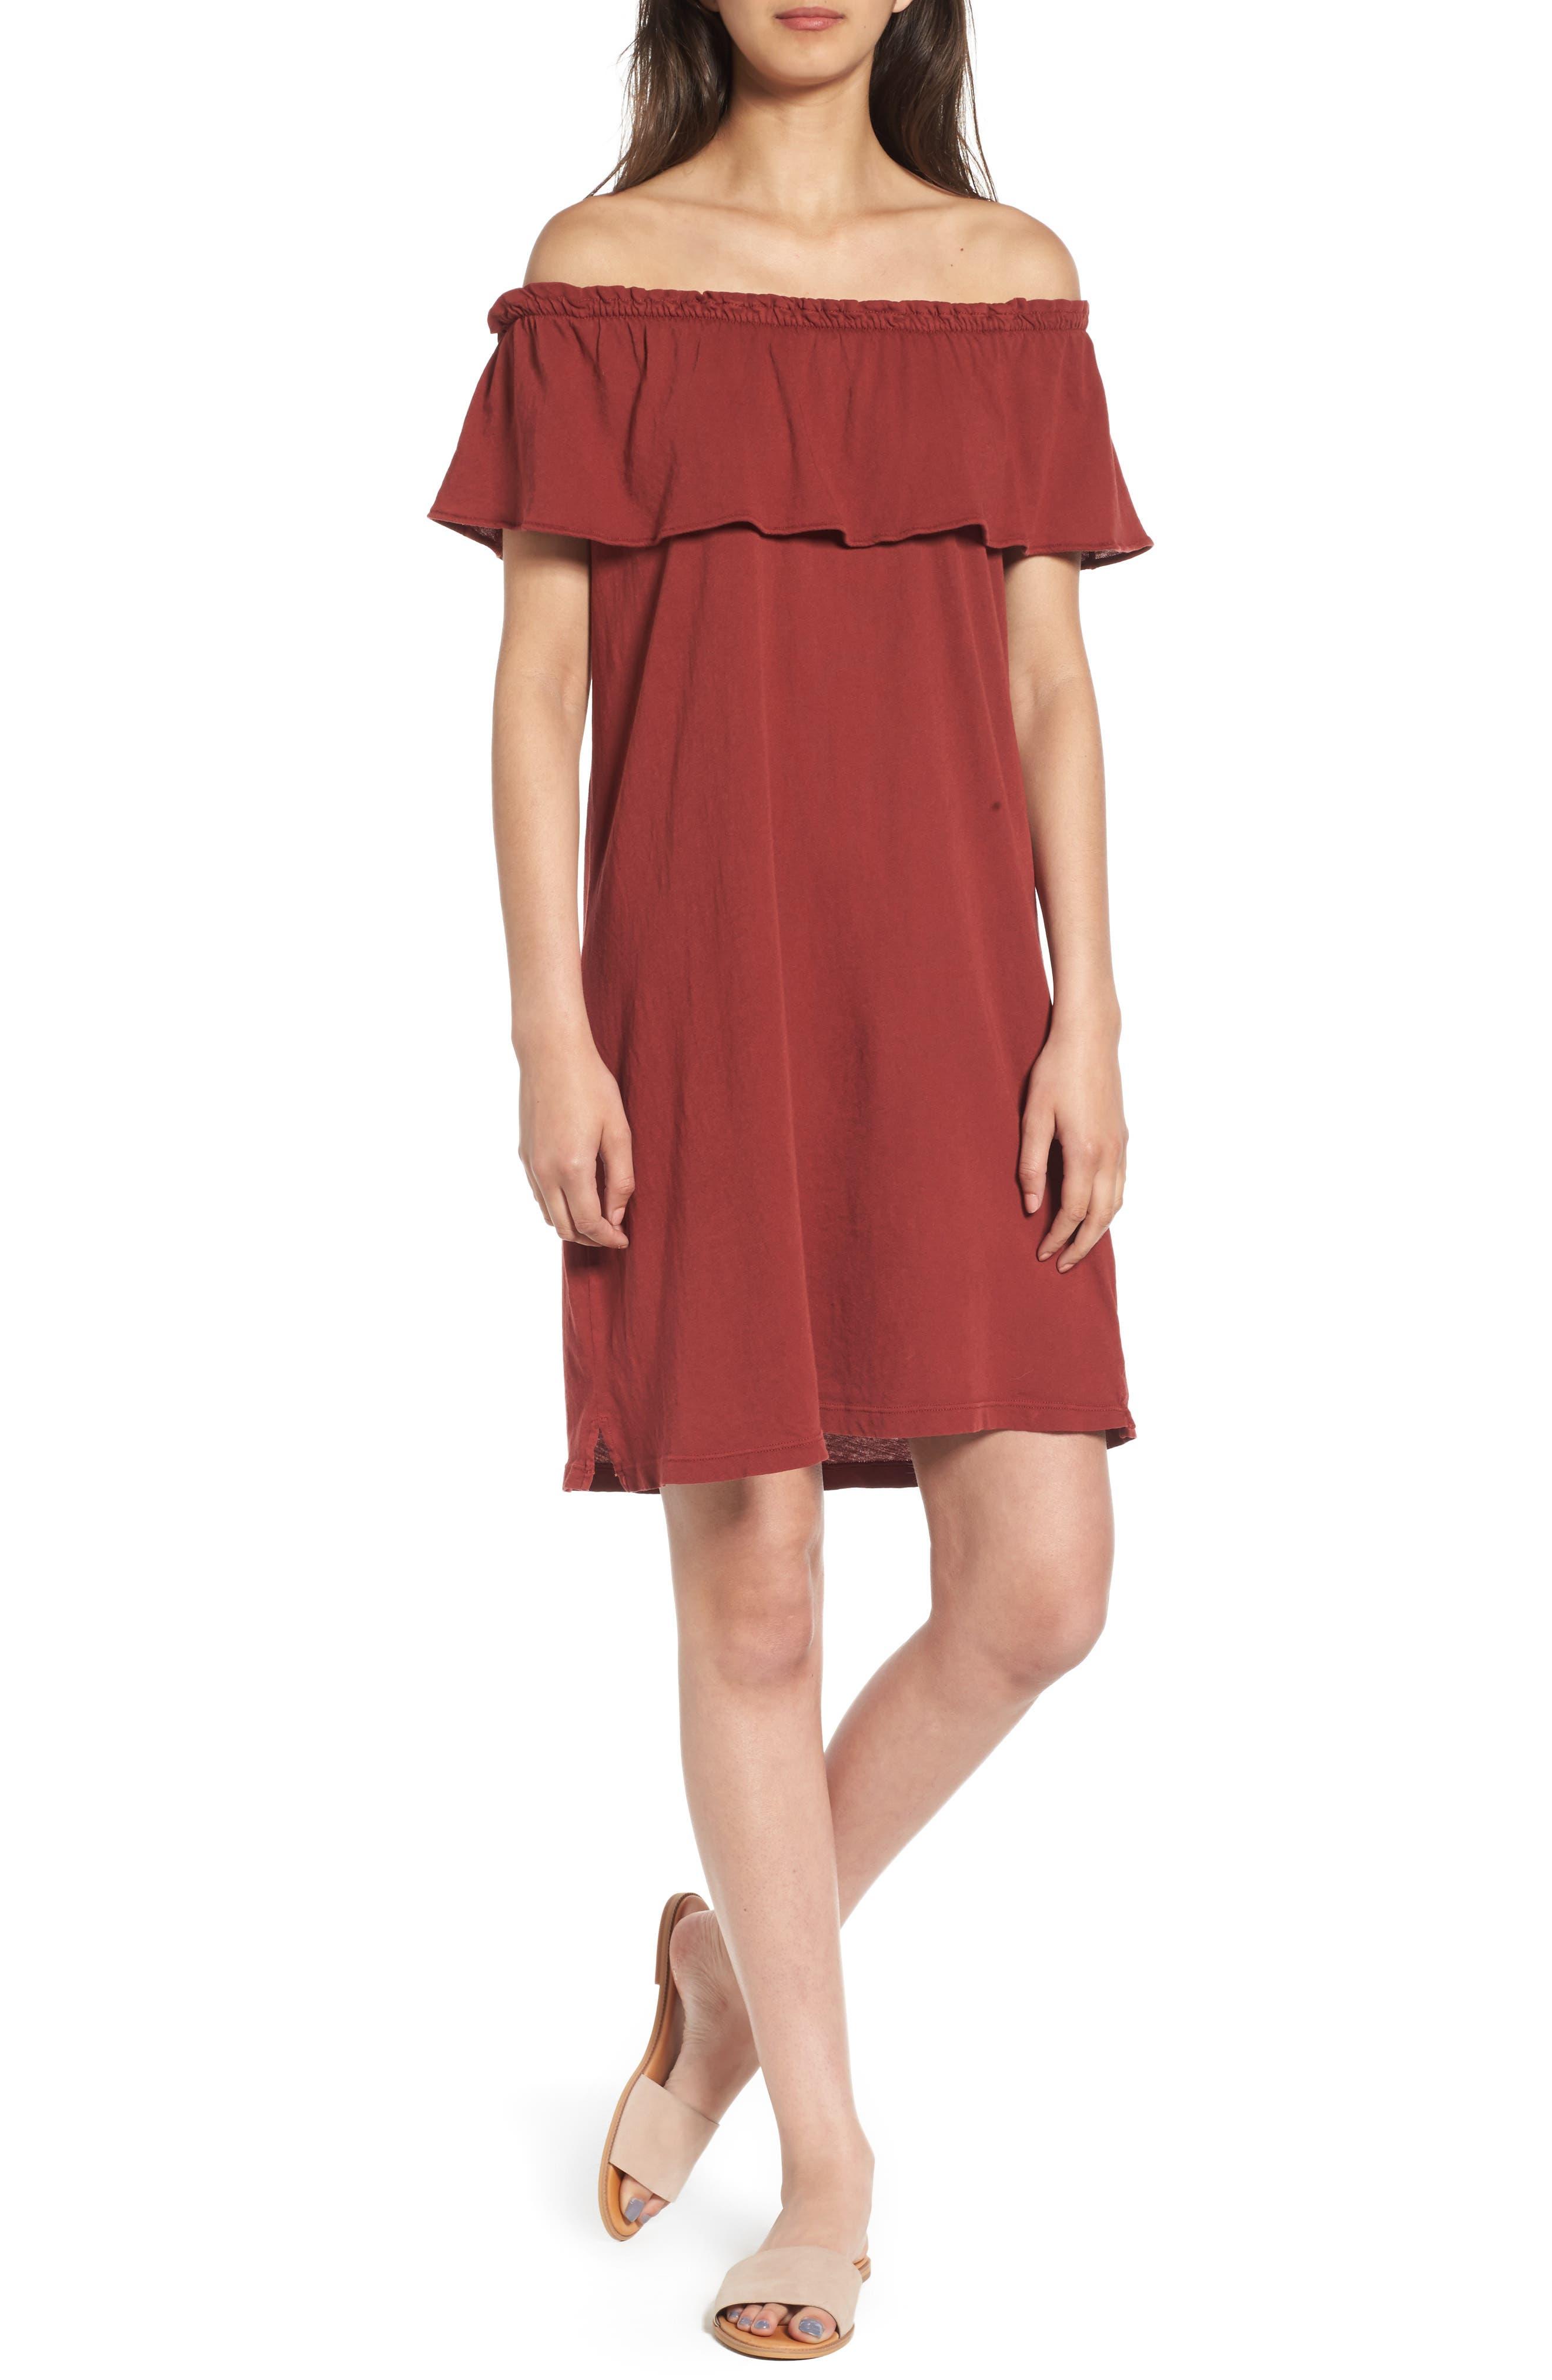 Main Image - Current/Elliott Ruffle Off the Shoulder Dress